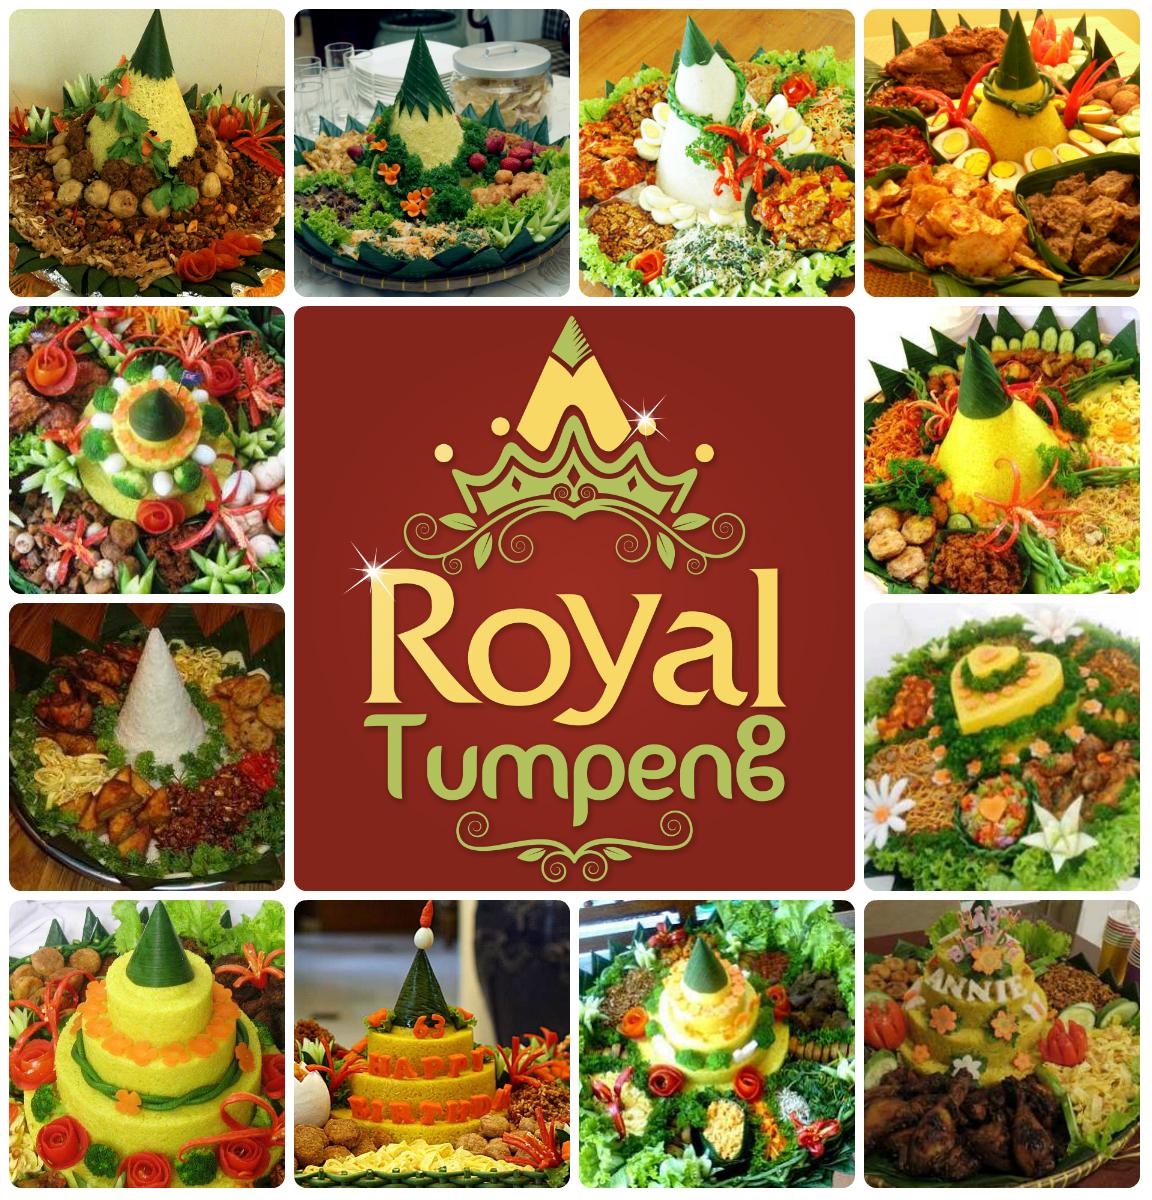 Jual Nasi Tumpeng Di Jakarta Barat Telp 081287608239 Beras Putih By Sehat Bogor